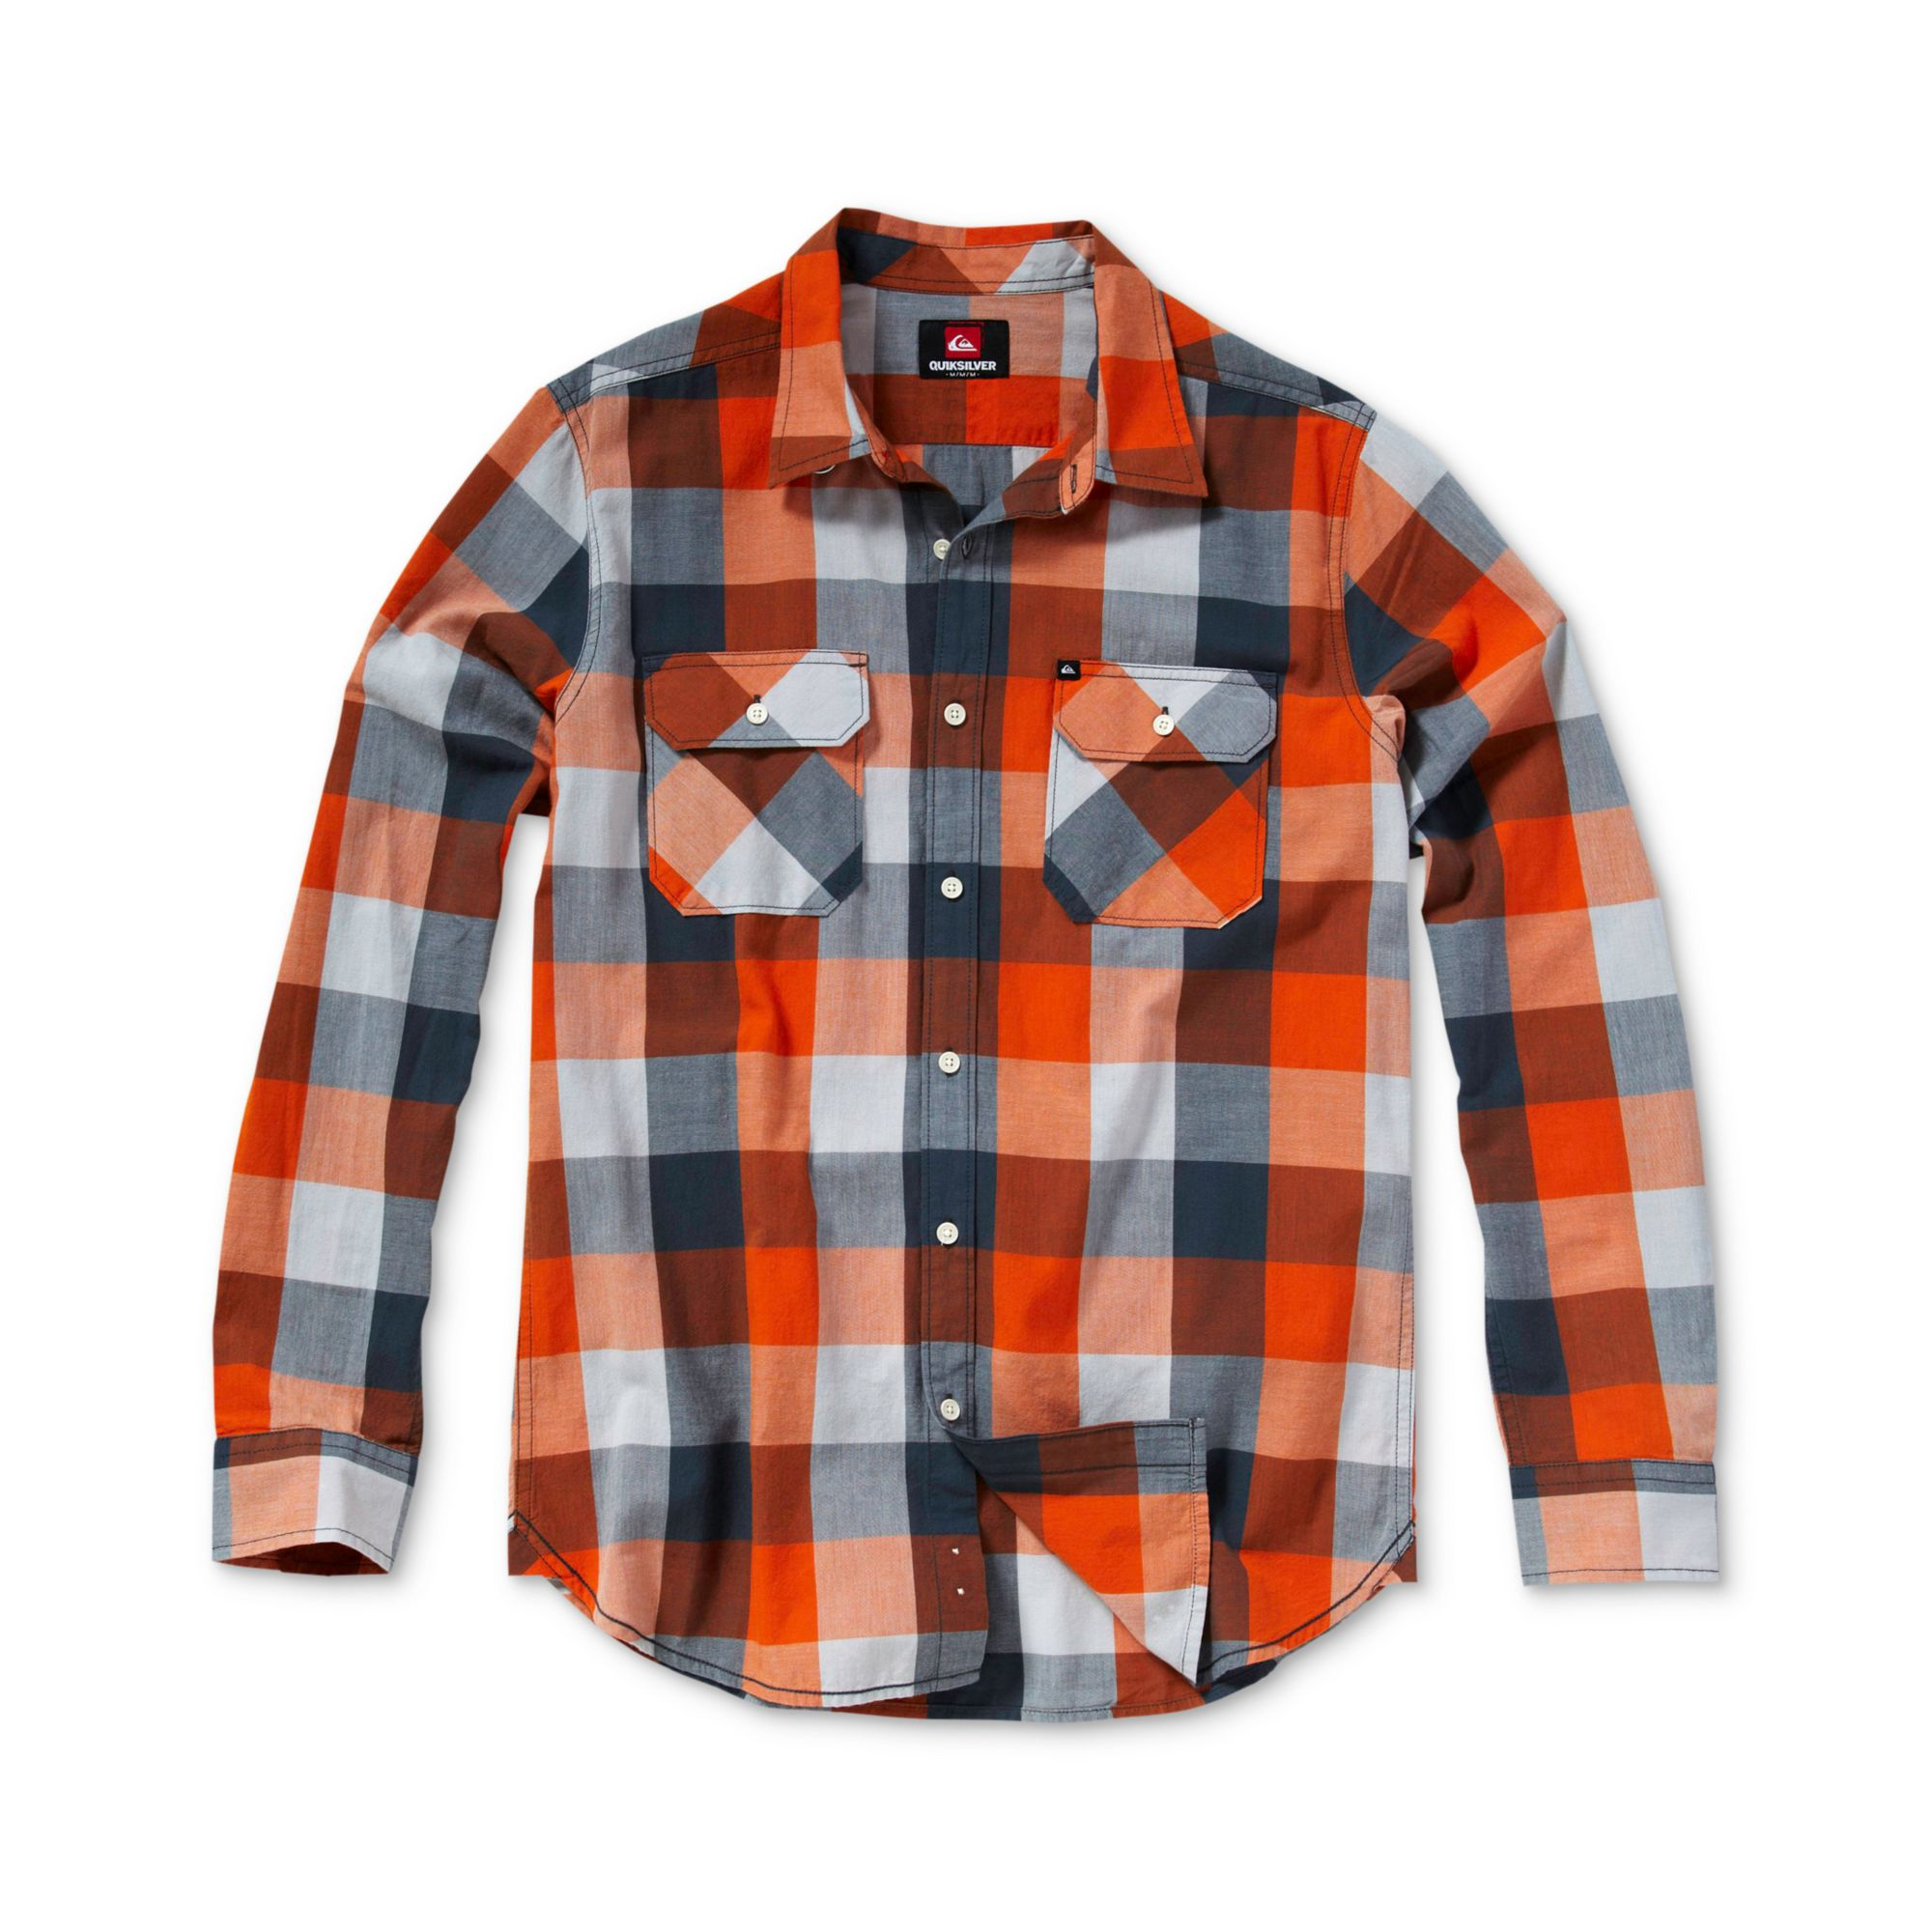 Quiksilver Running Bull Long Sleeve Plaid Shirt In Orange